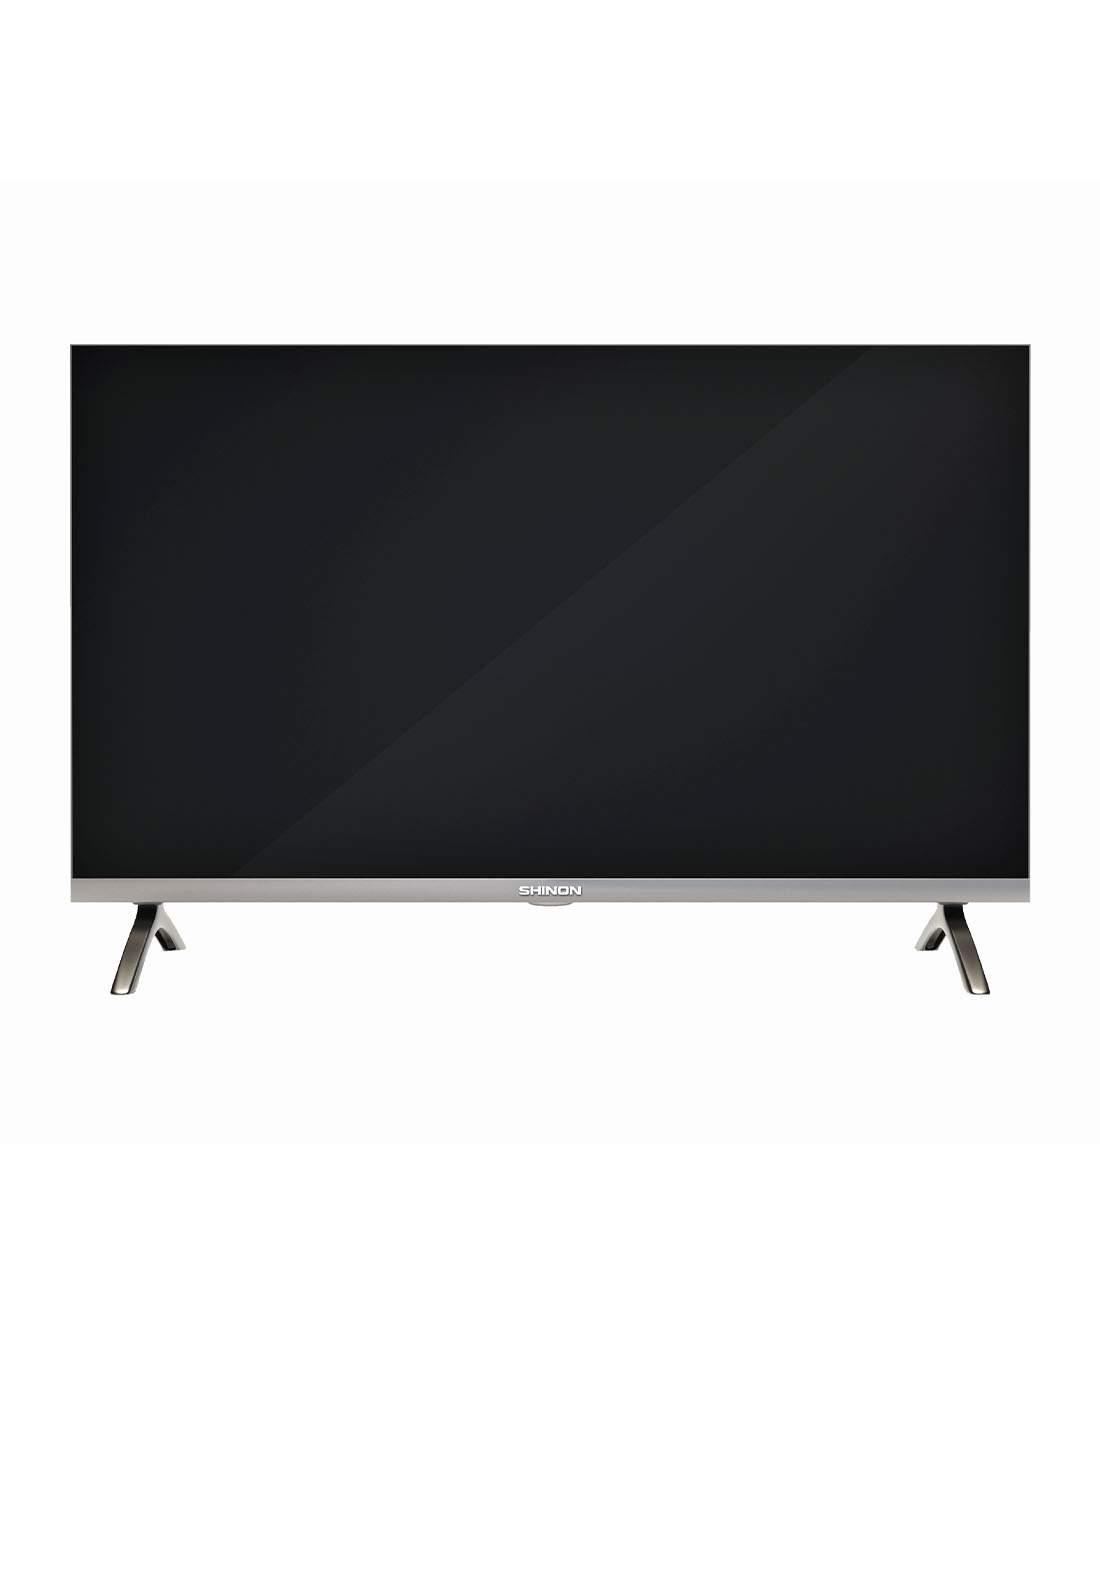 M8T- FHD SMART TV -LED 43 شاشة